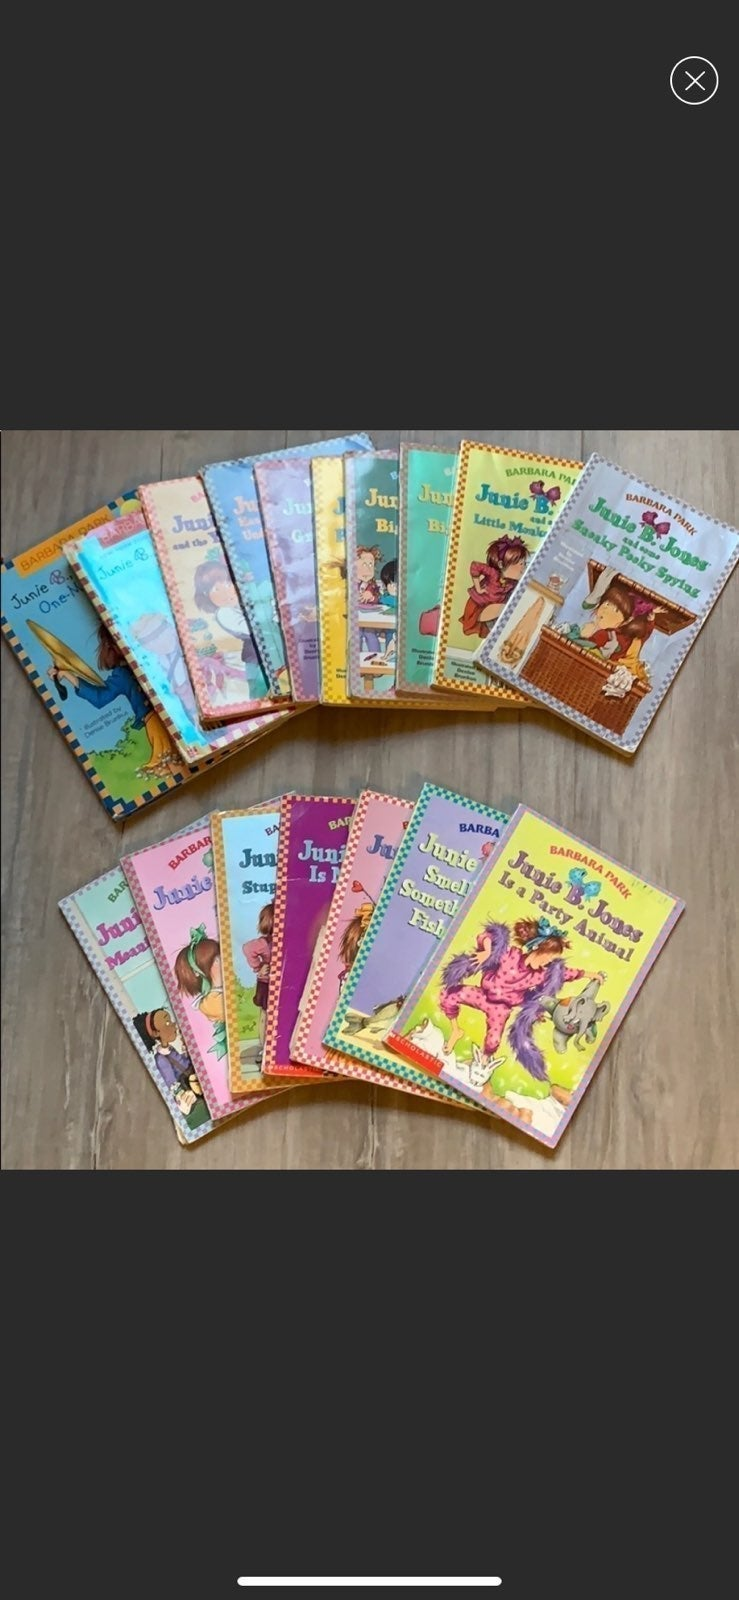 Set of Junie B. Jones book